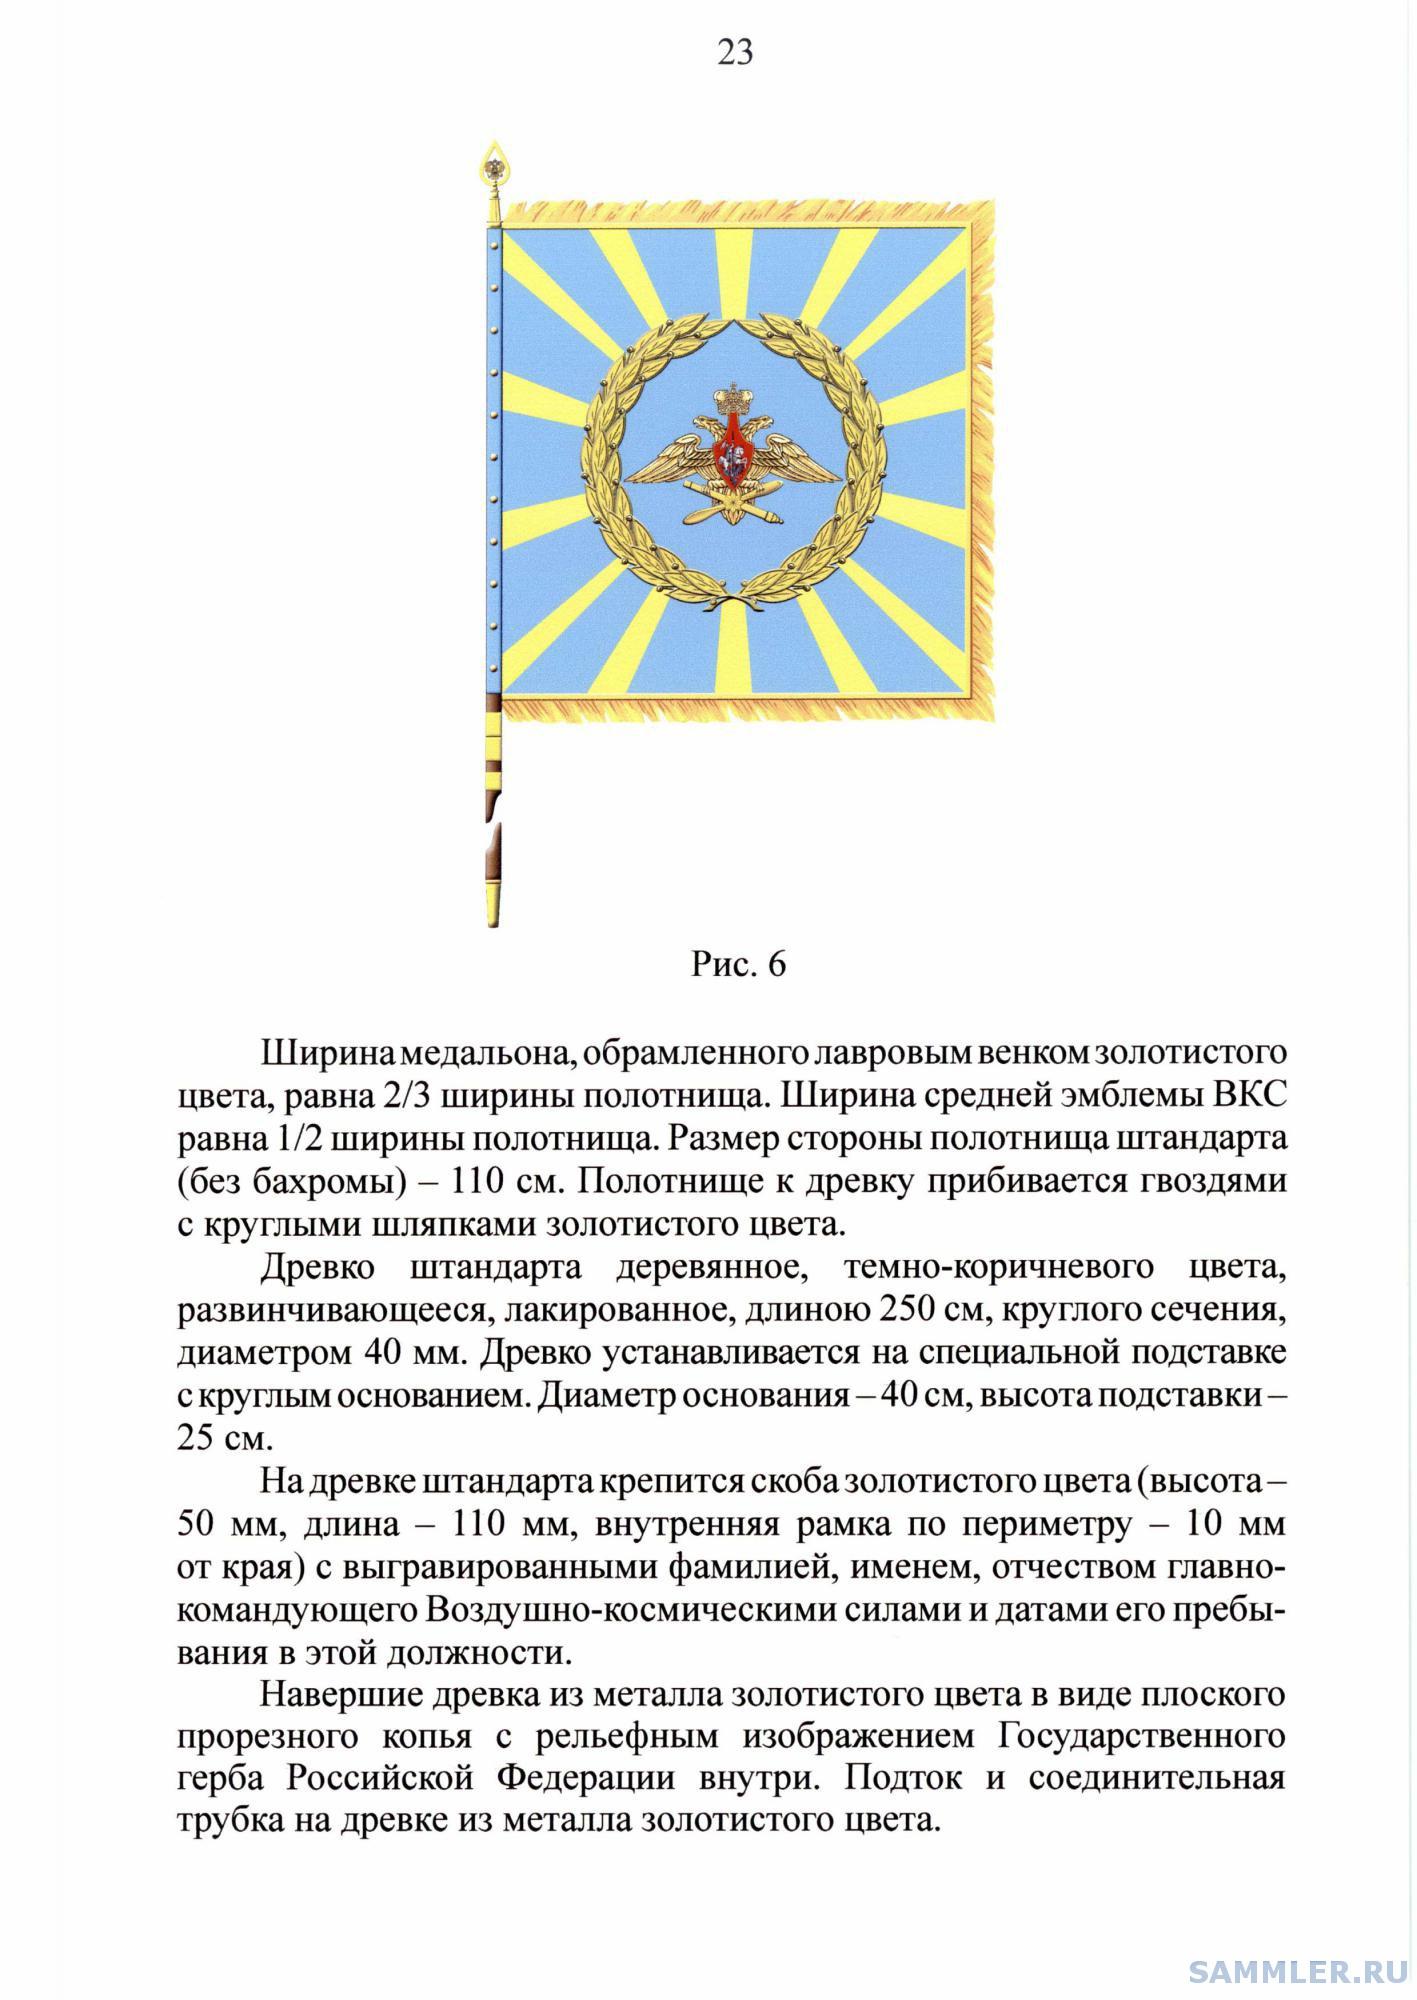 МО РФ 470(цвет)-23.jpg